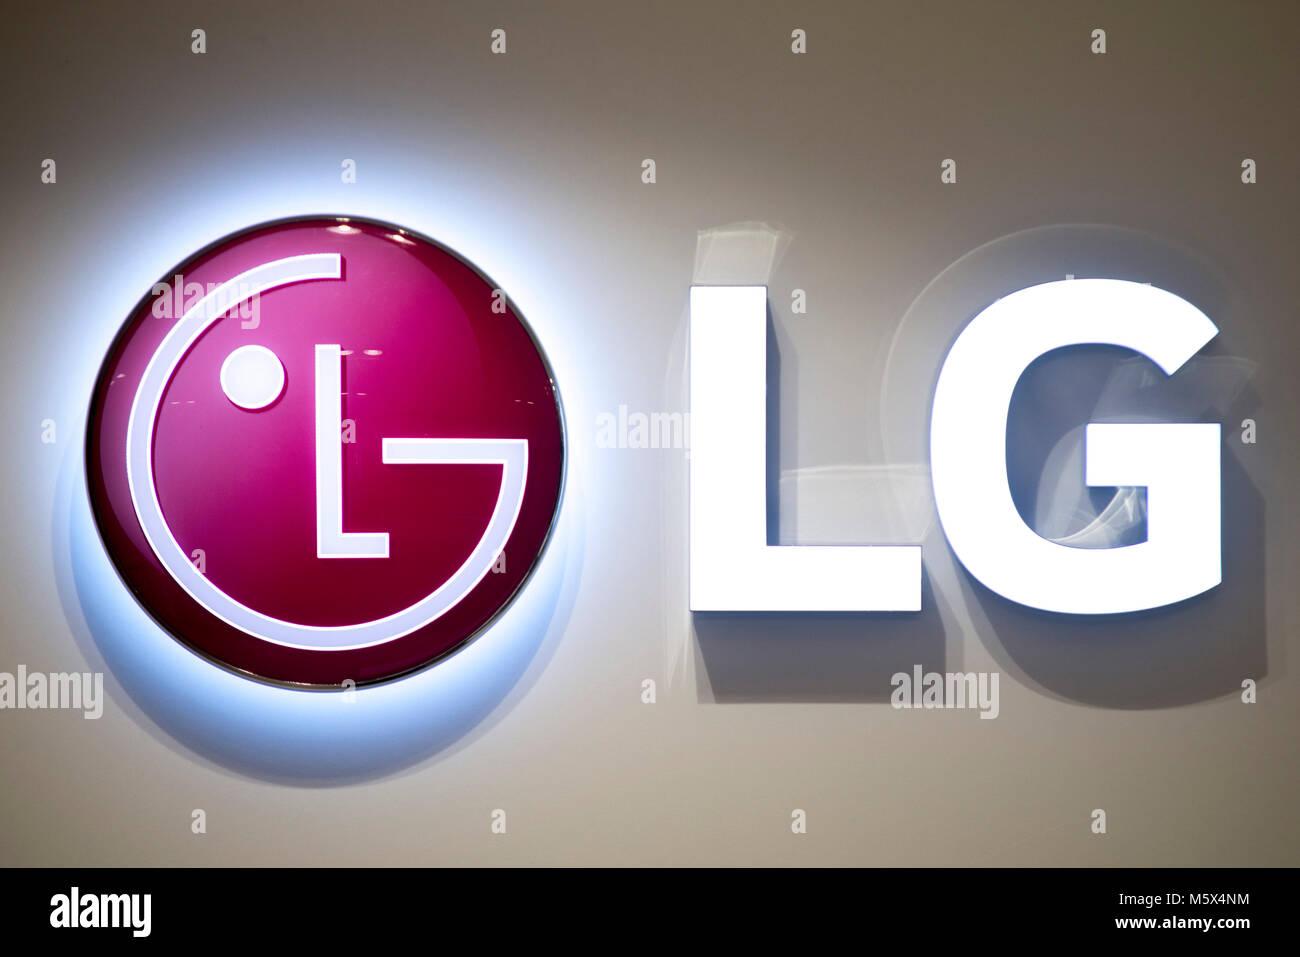 Lg Logo Stock Photos & Lg Logo Stock Images - Alamy